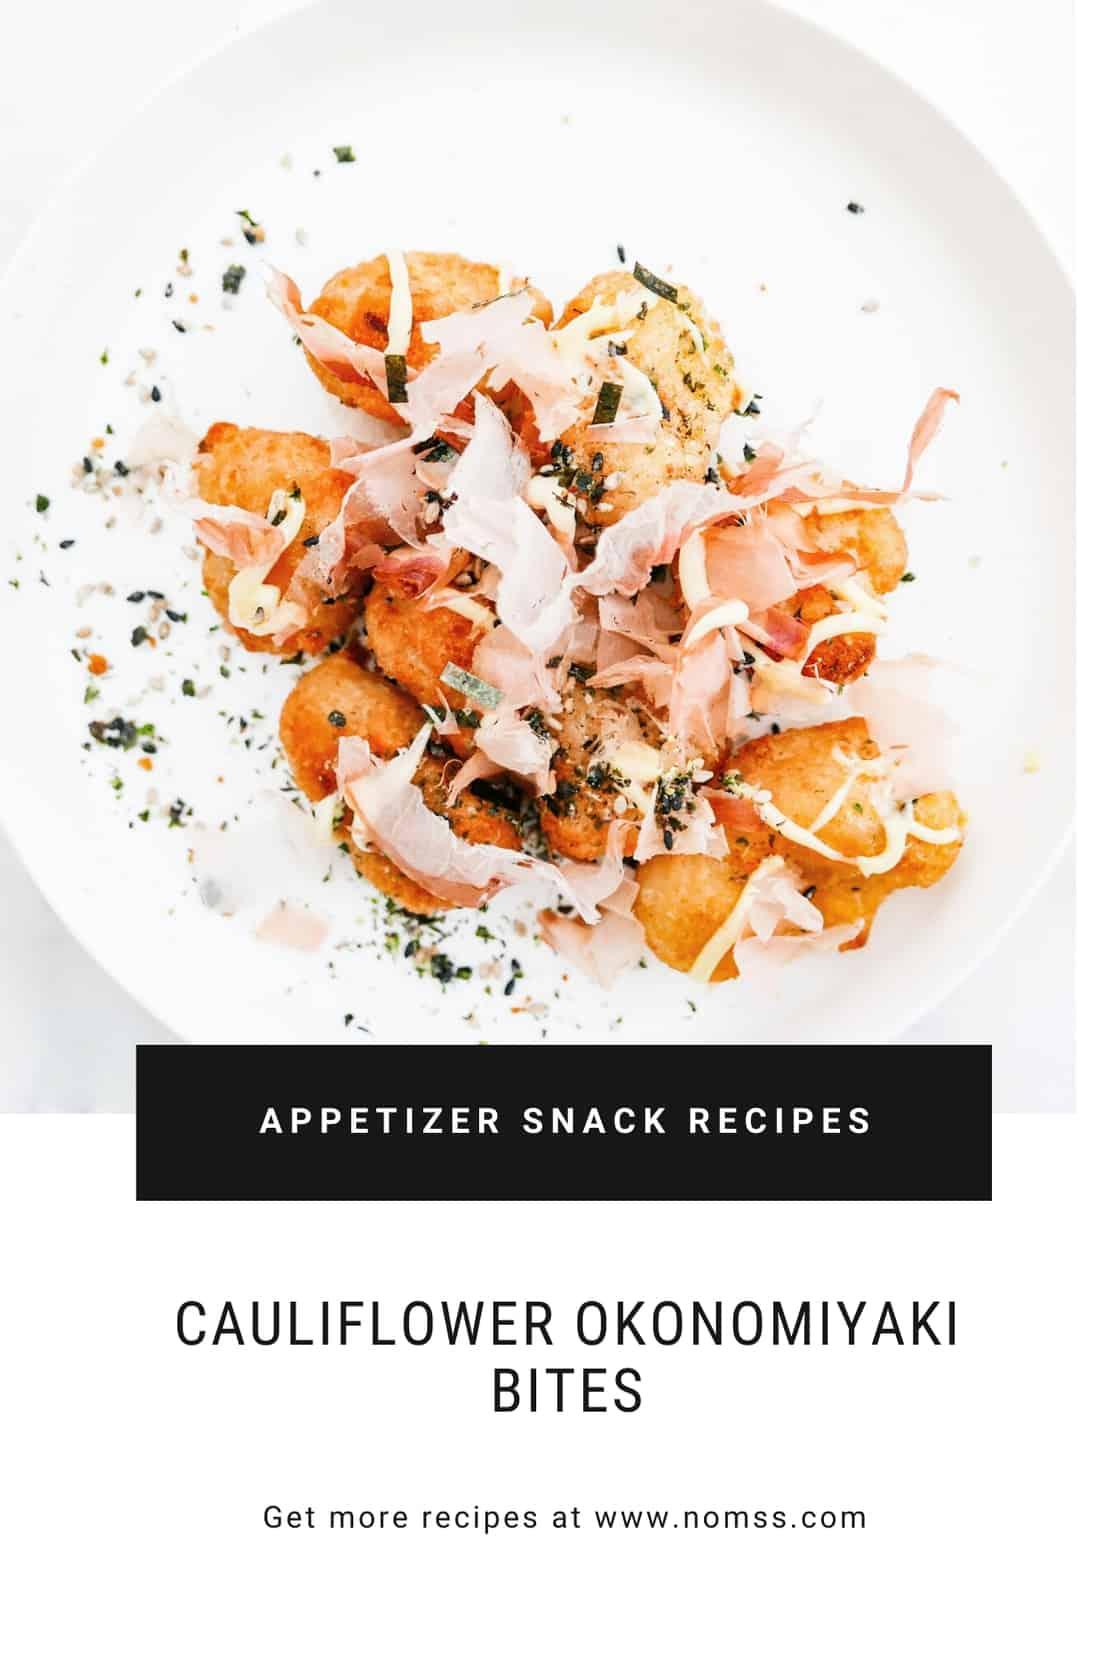 vegan crispy cauliflower bites